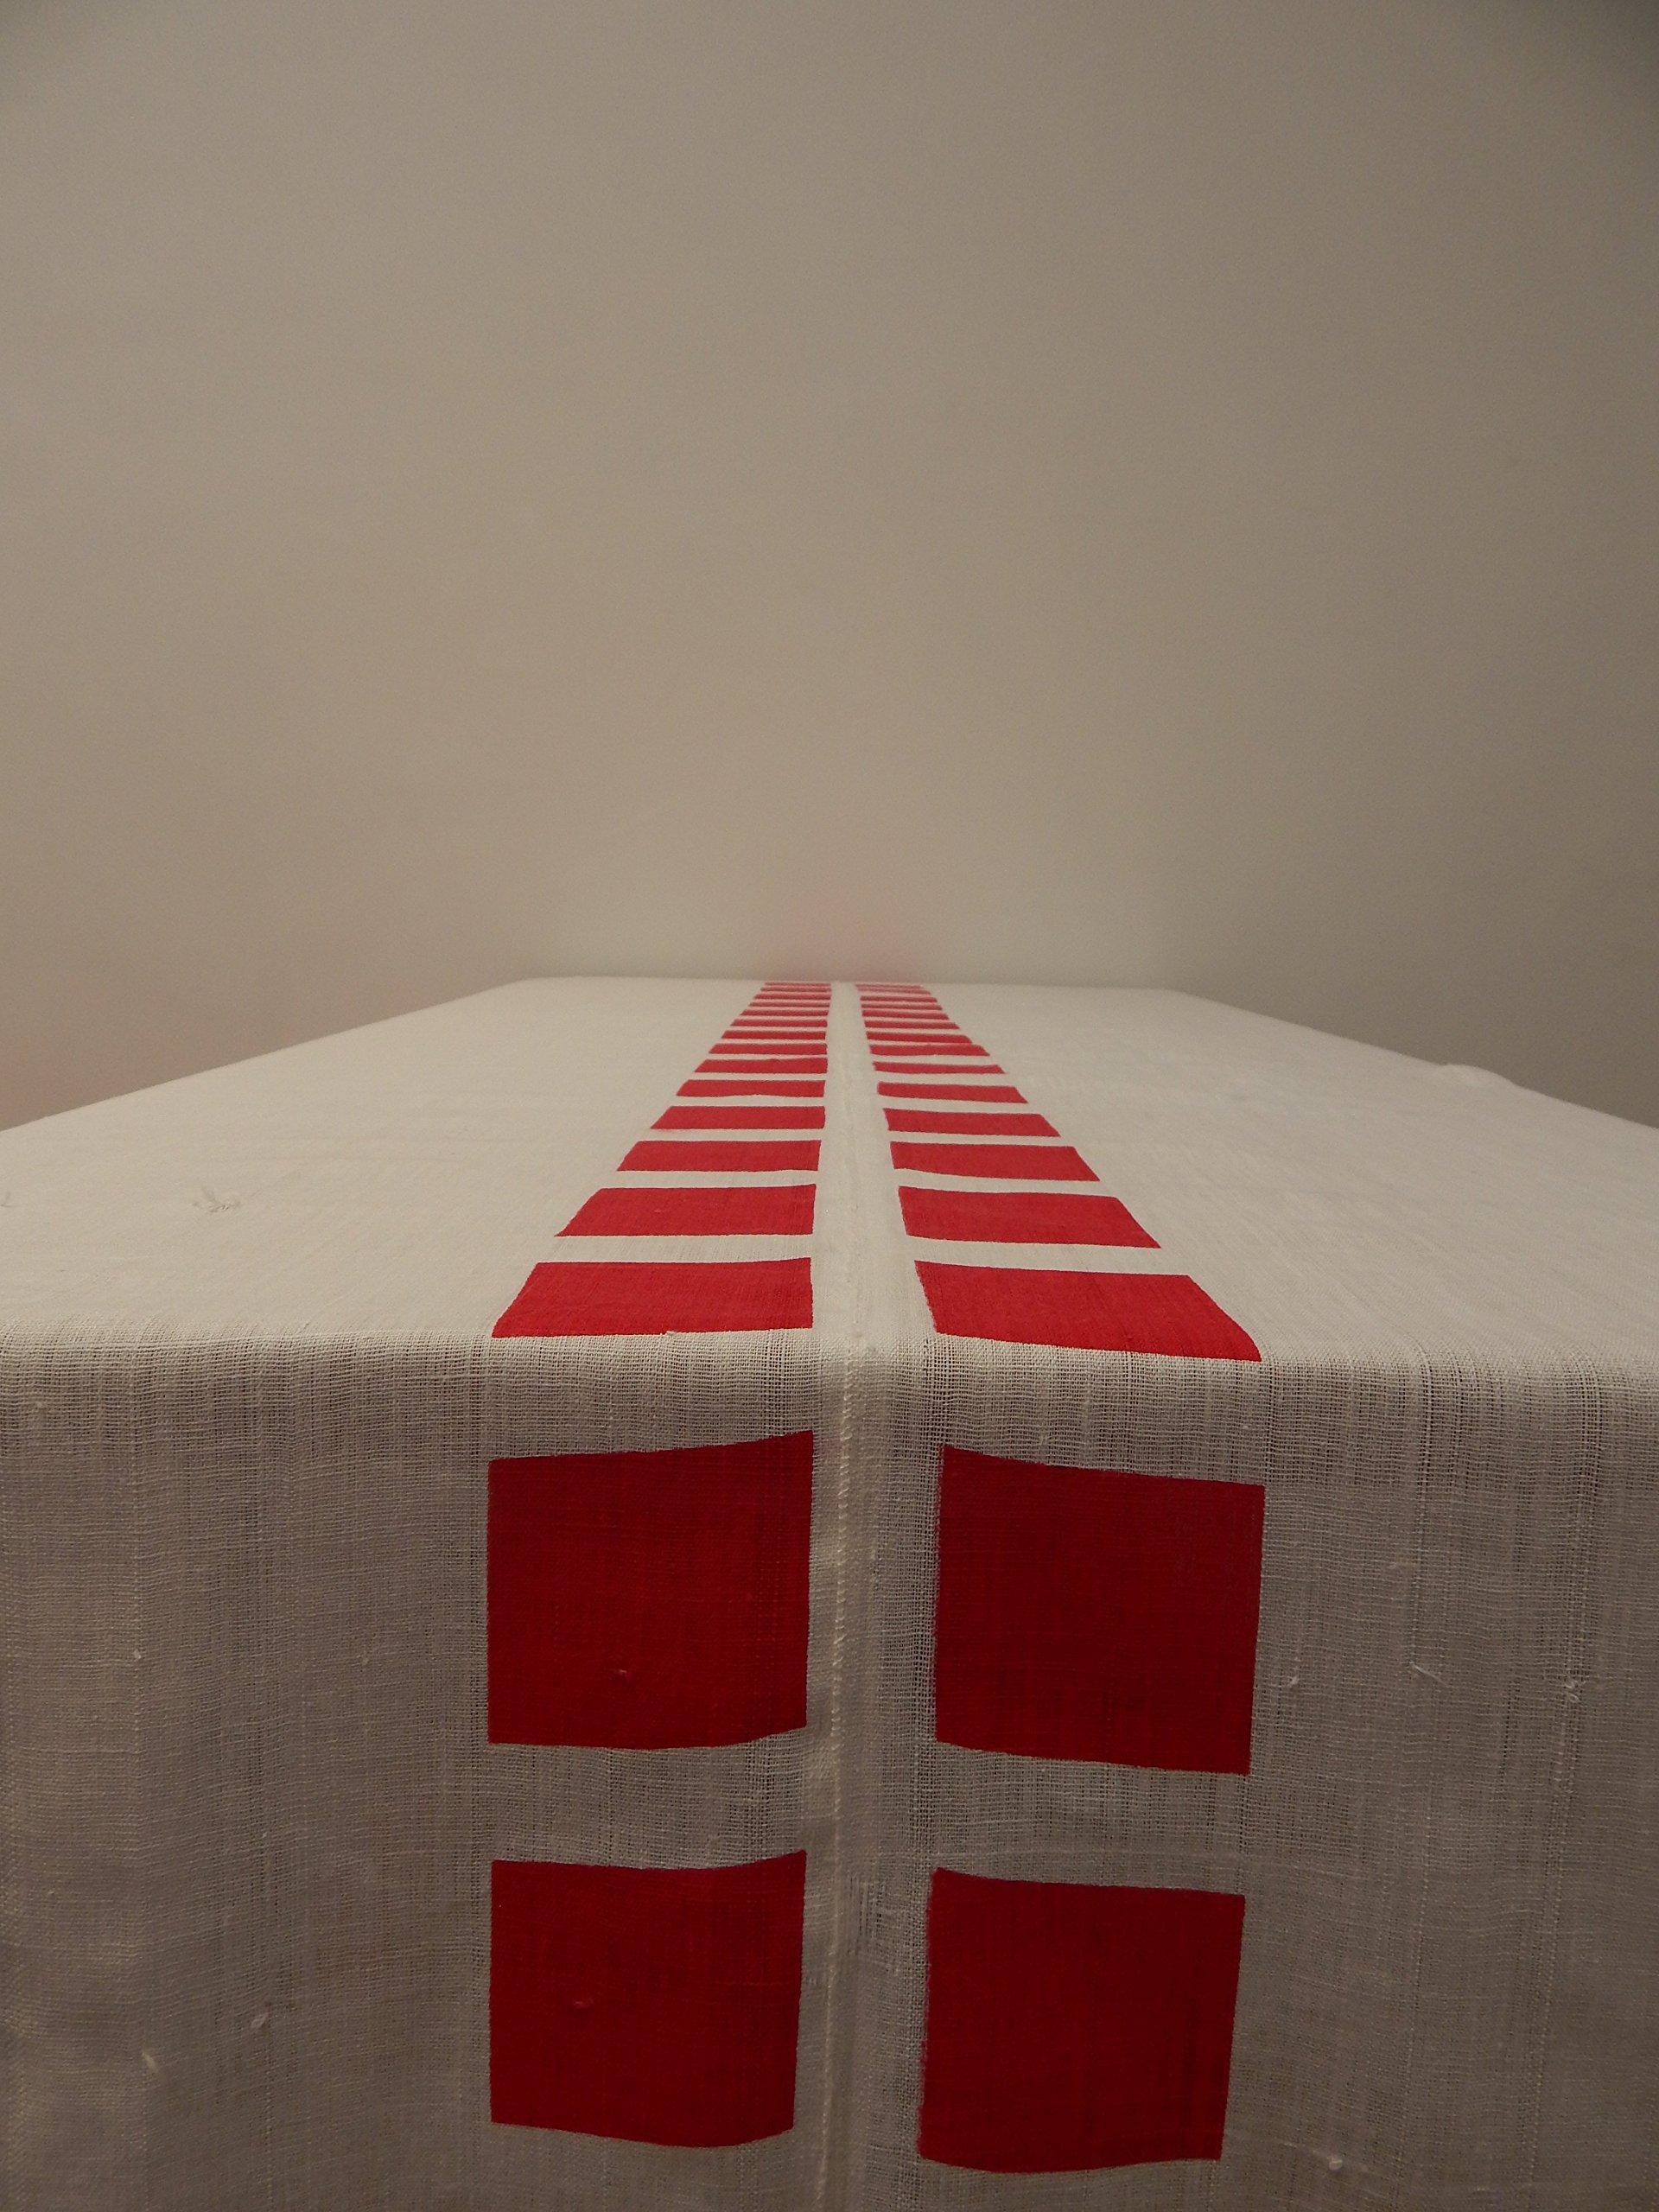 Gitika Goyal Home Cotton Khadi Red Screen Printed Tablecloth with Square Design, white, 72'' x 72''